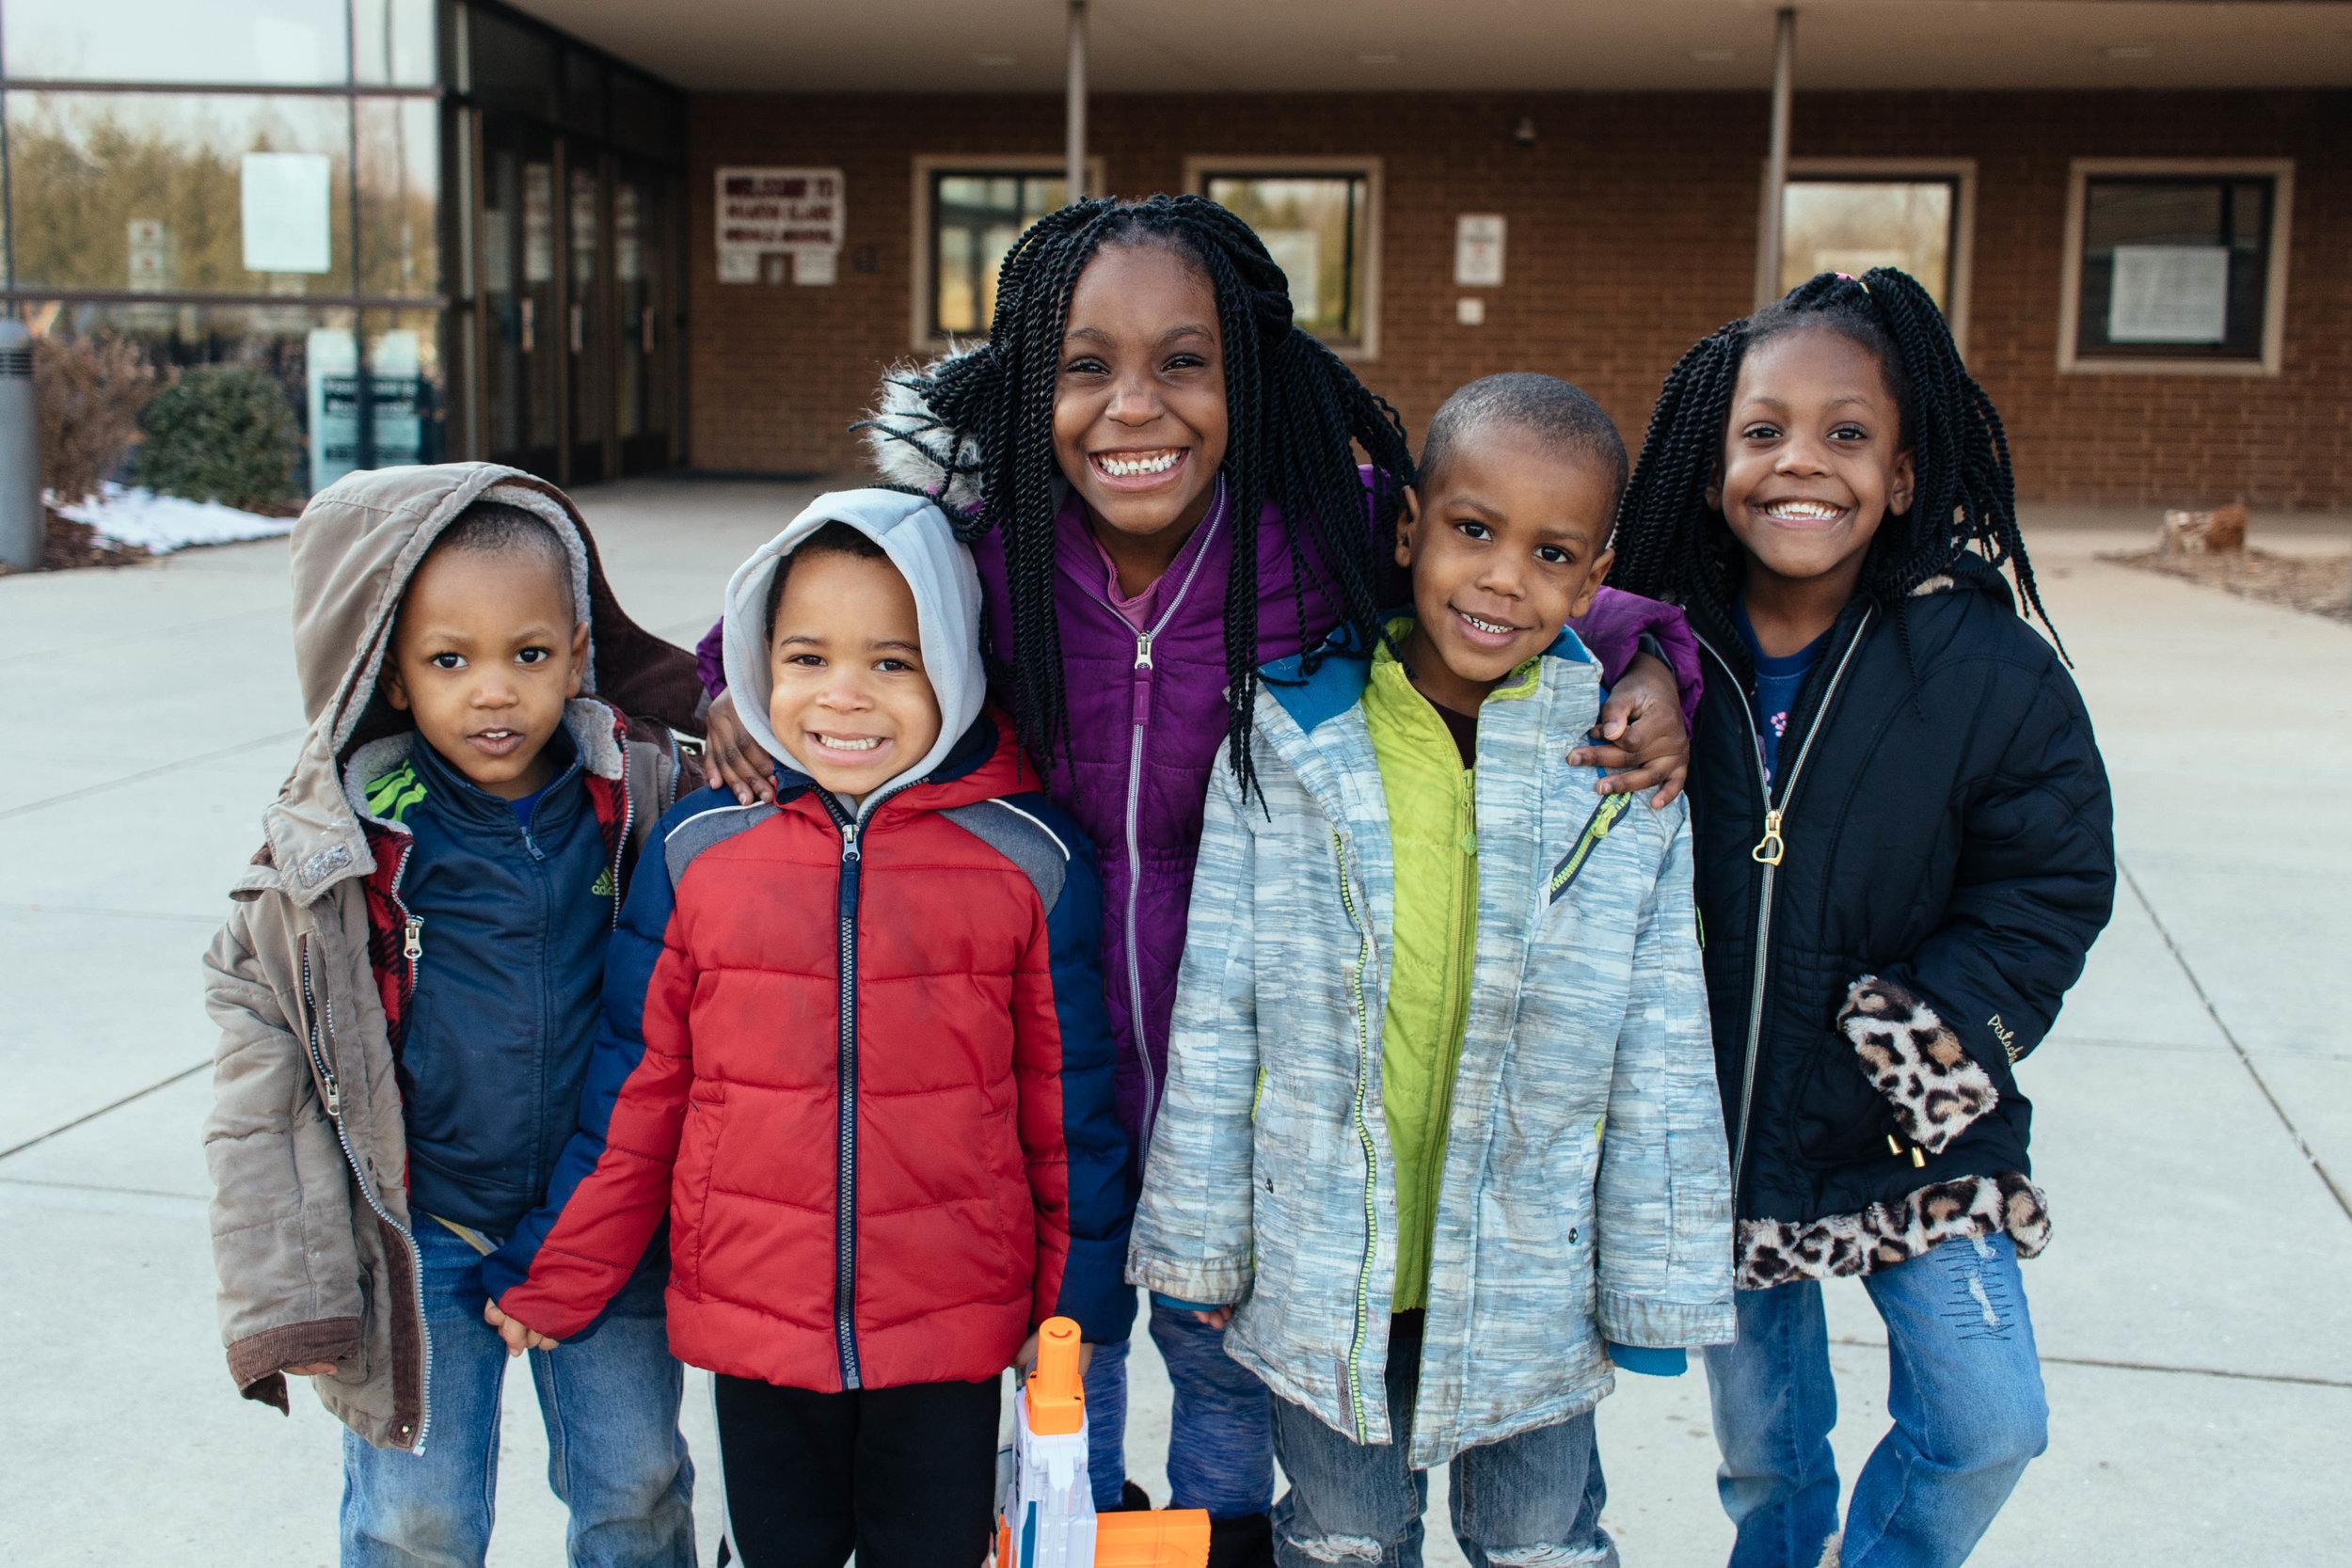 Brenda's children with Marie and Sam Franklin 's grandson. Photo by Kristen Trudo.